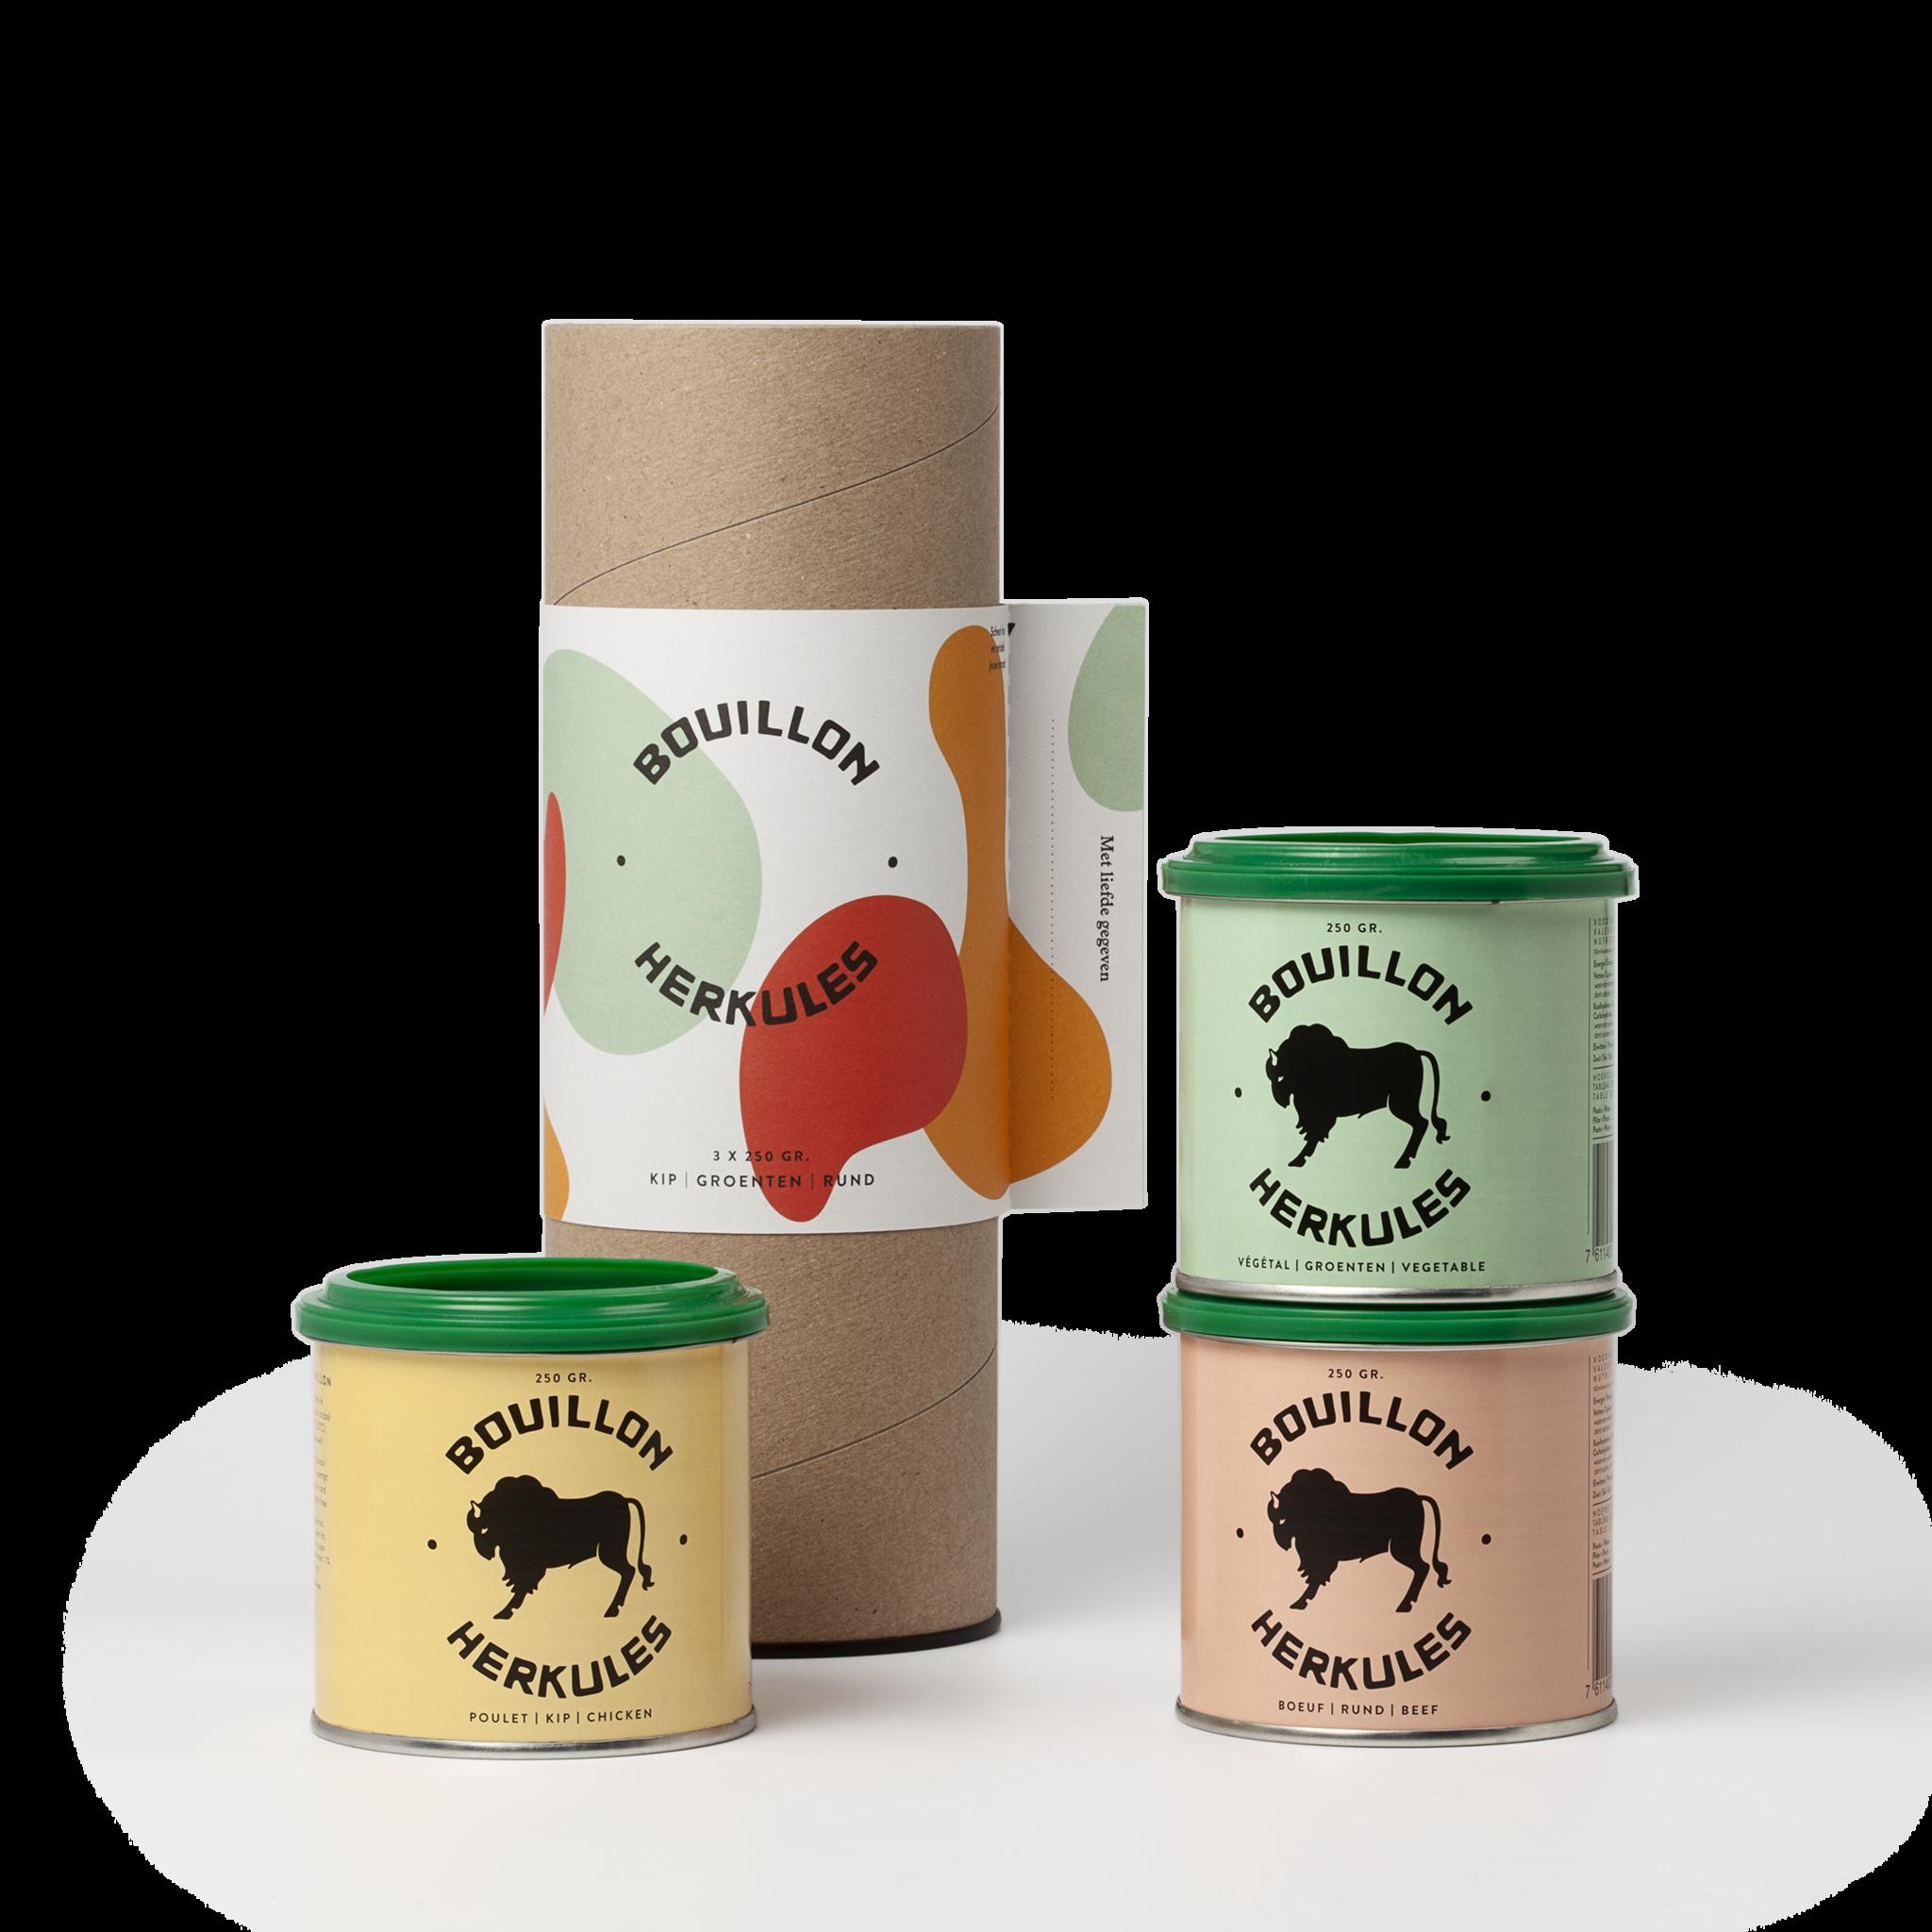 bouillon-herkules-cadeaukoker